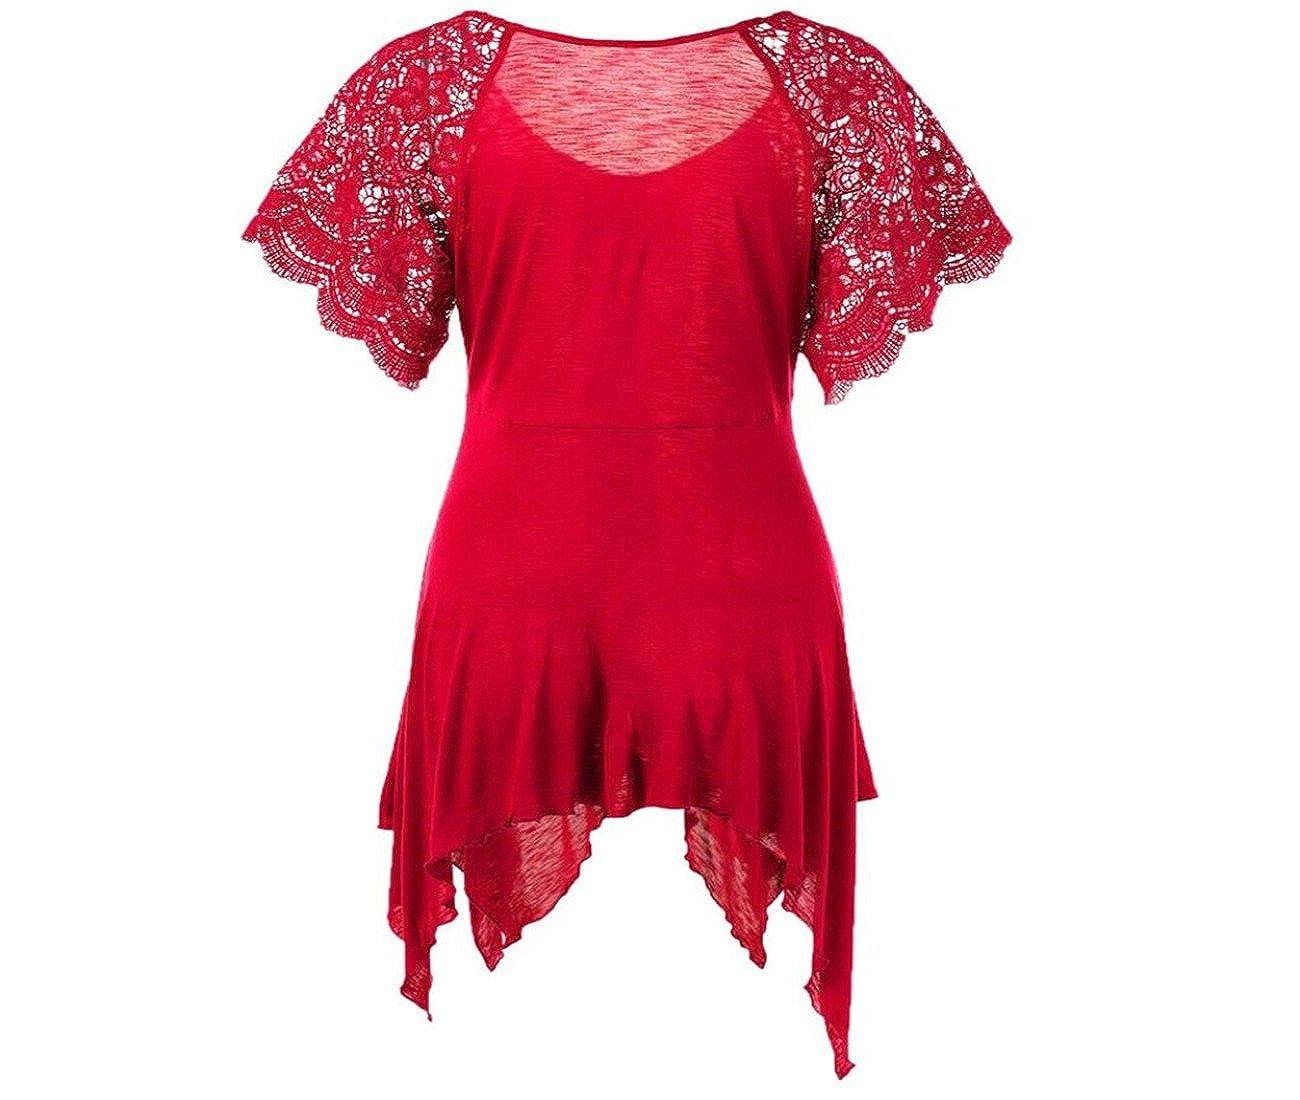 ABASSKY Dress for Women, Casual O-Neck Bandage High Waist Short Sleeve Lace Floral Patchwork Irregular Mini Dress